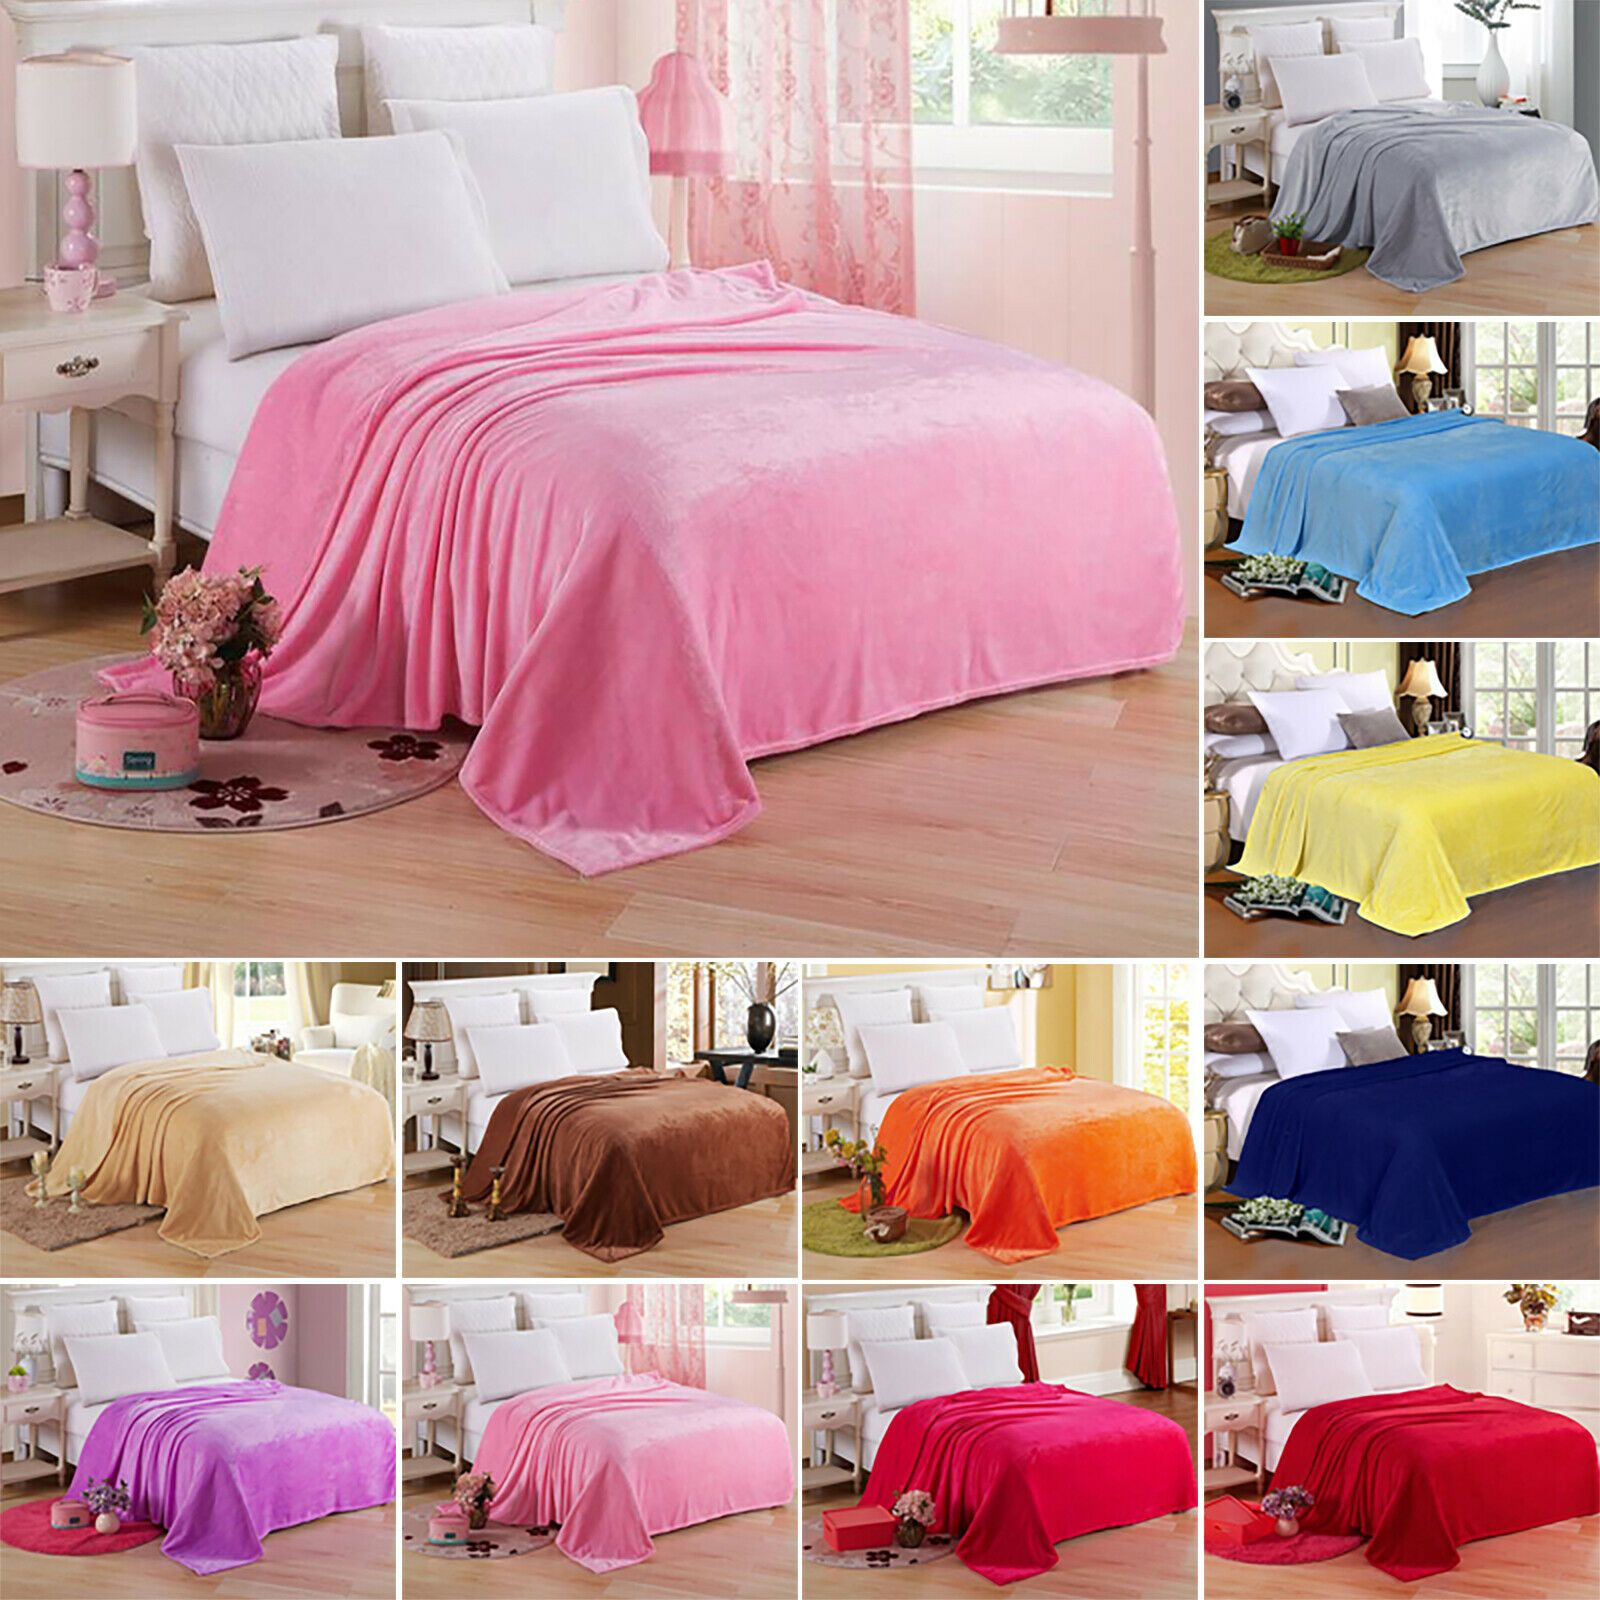 Warm Throw Over Plush Sofa Bed Fleece